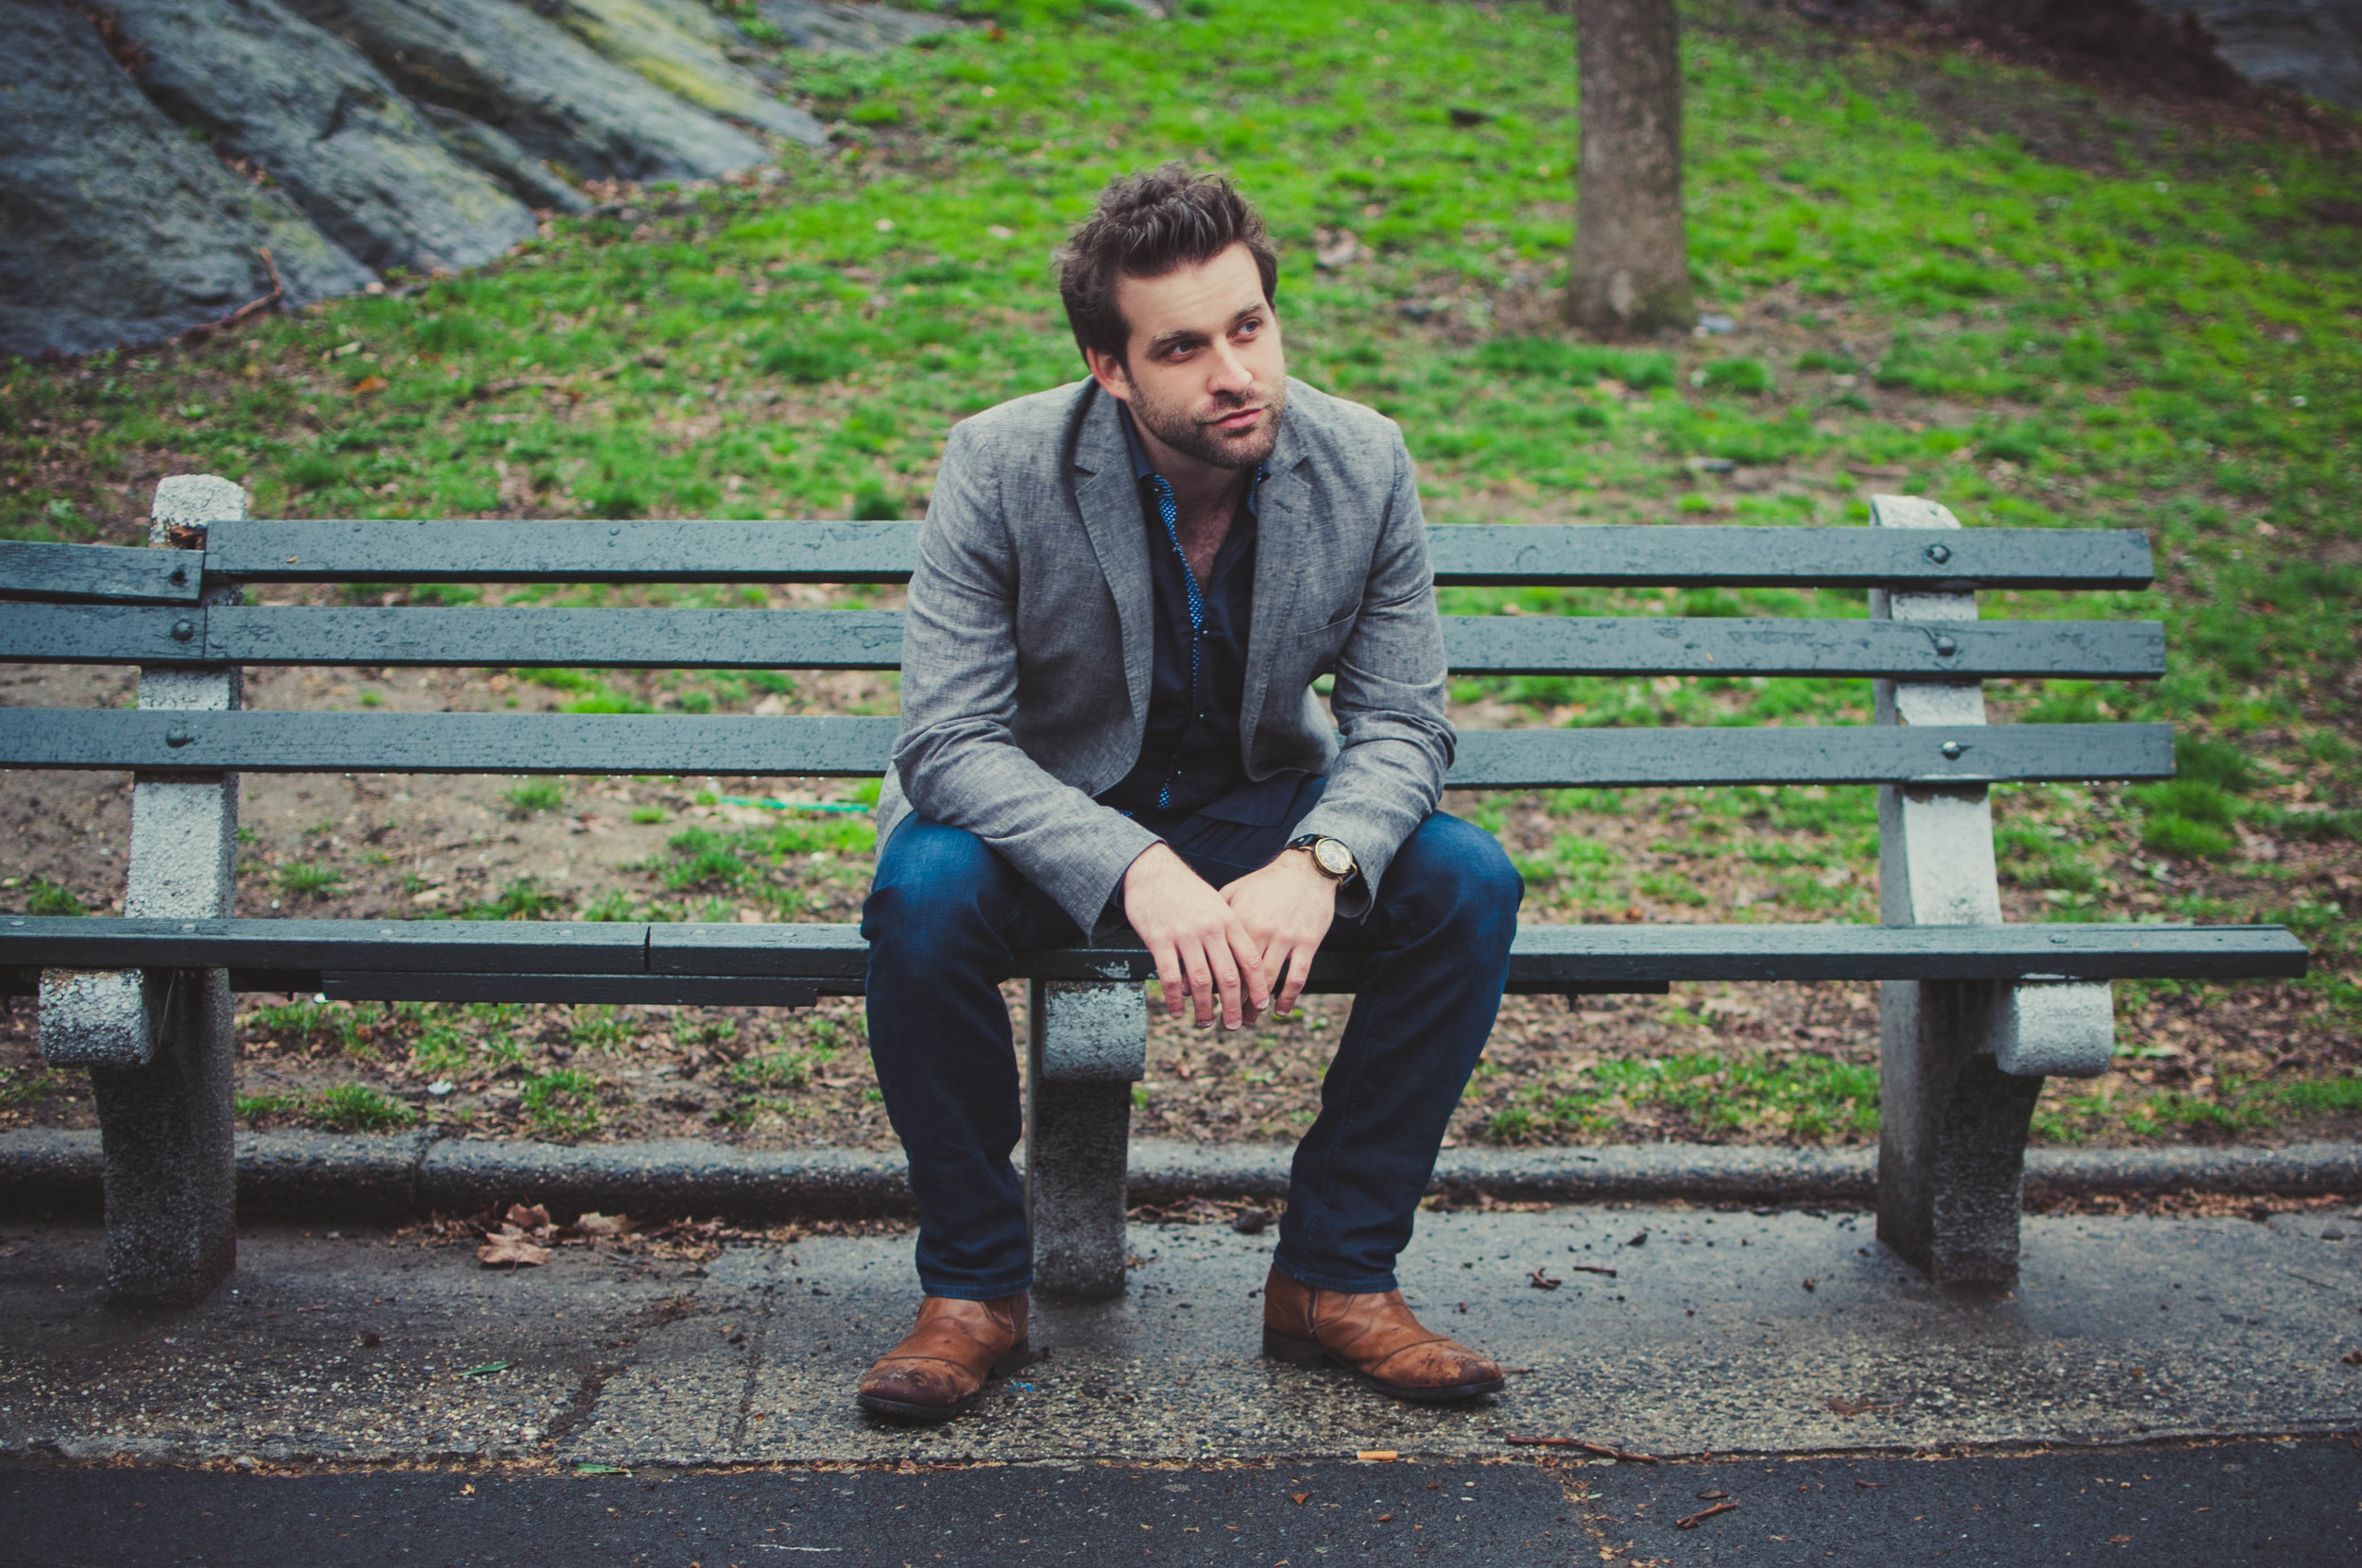 Photo by Lauren Desberg